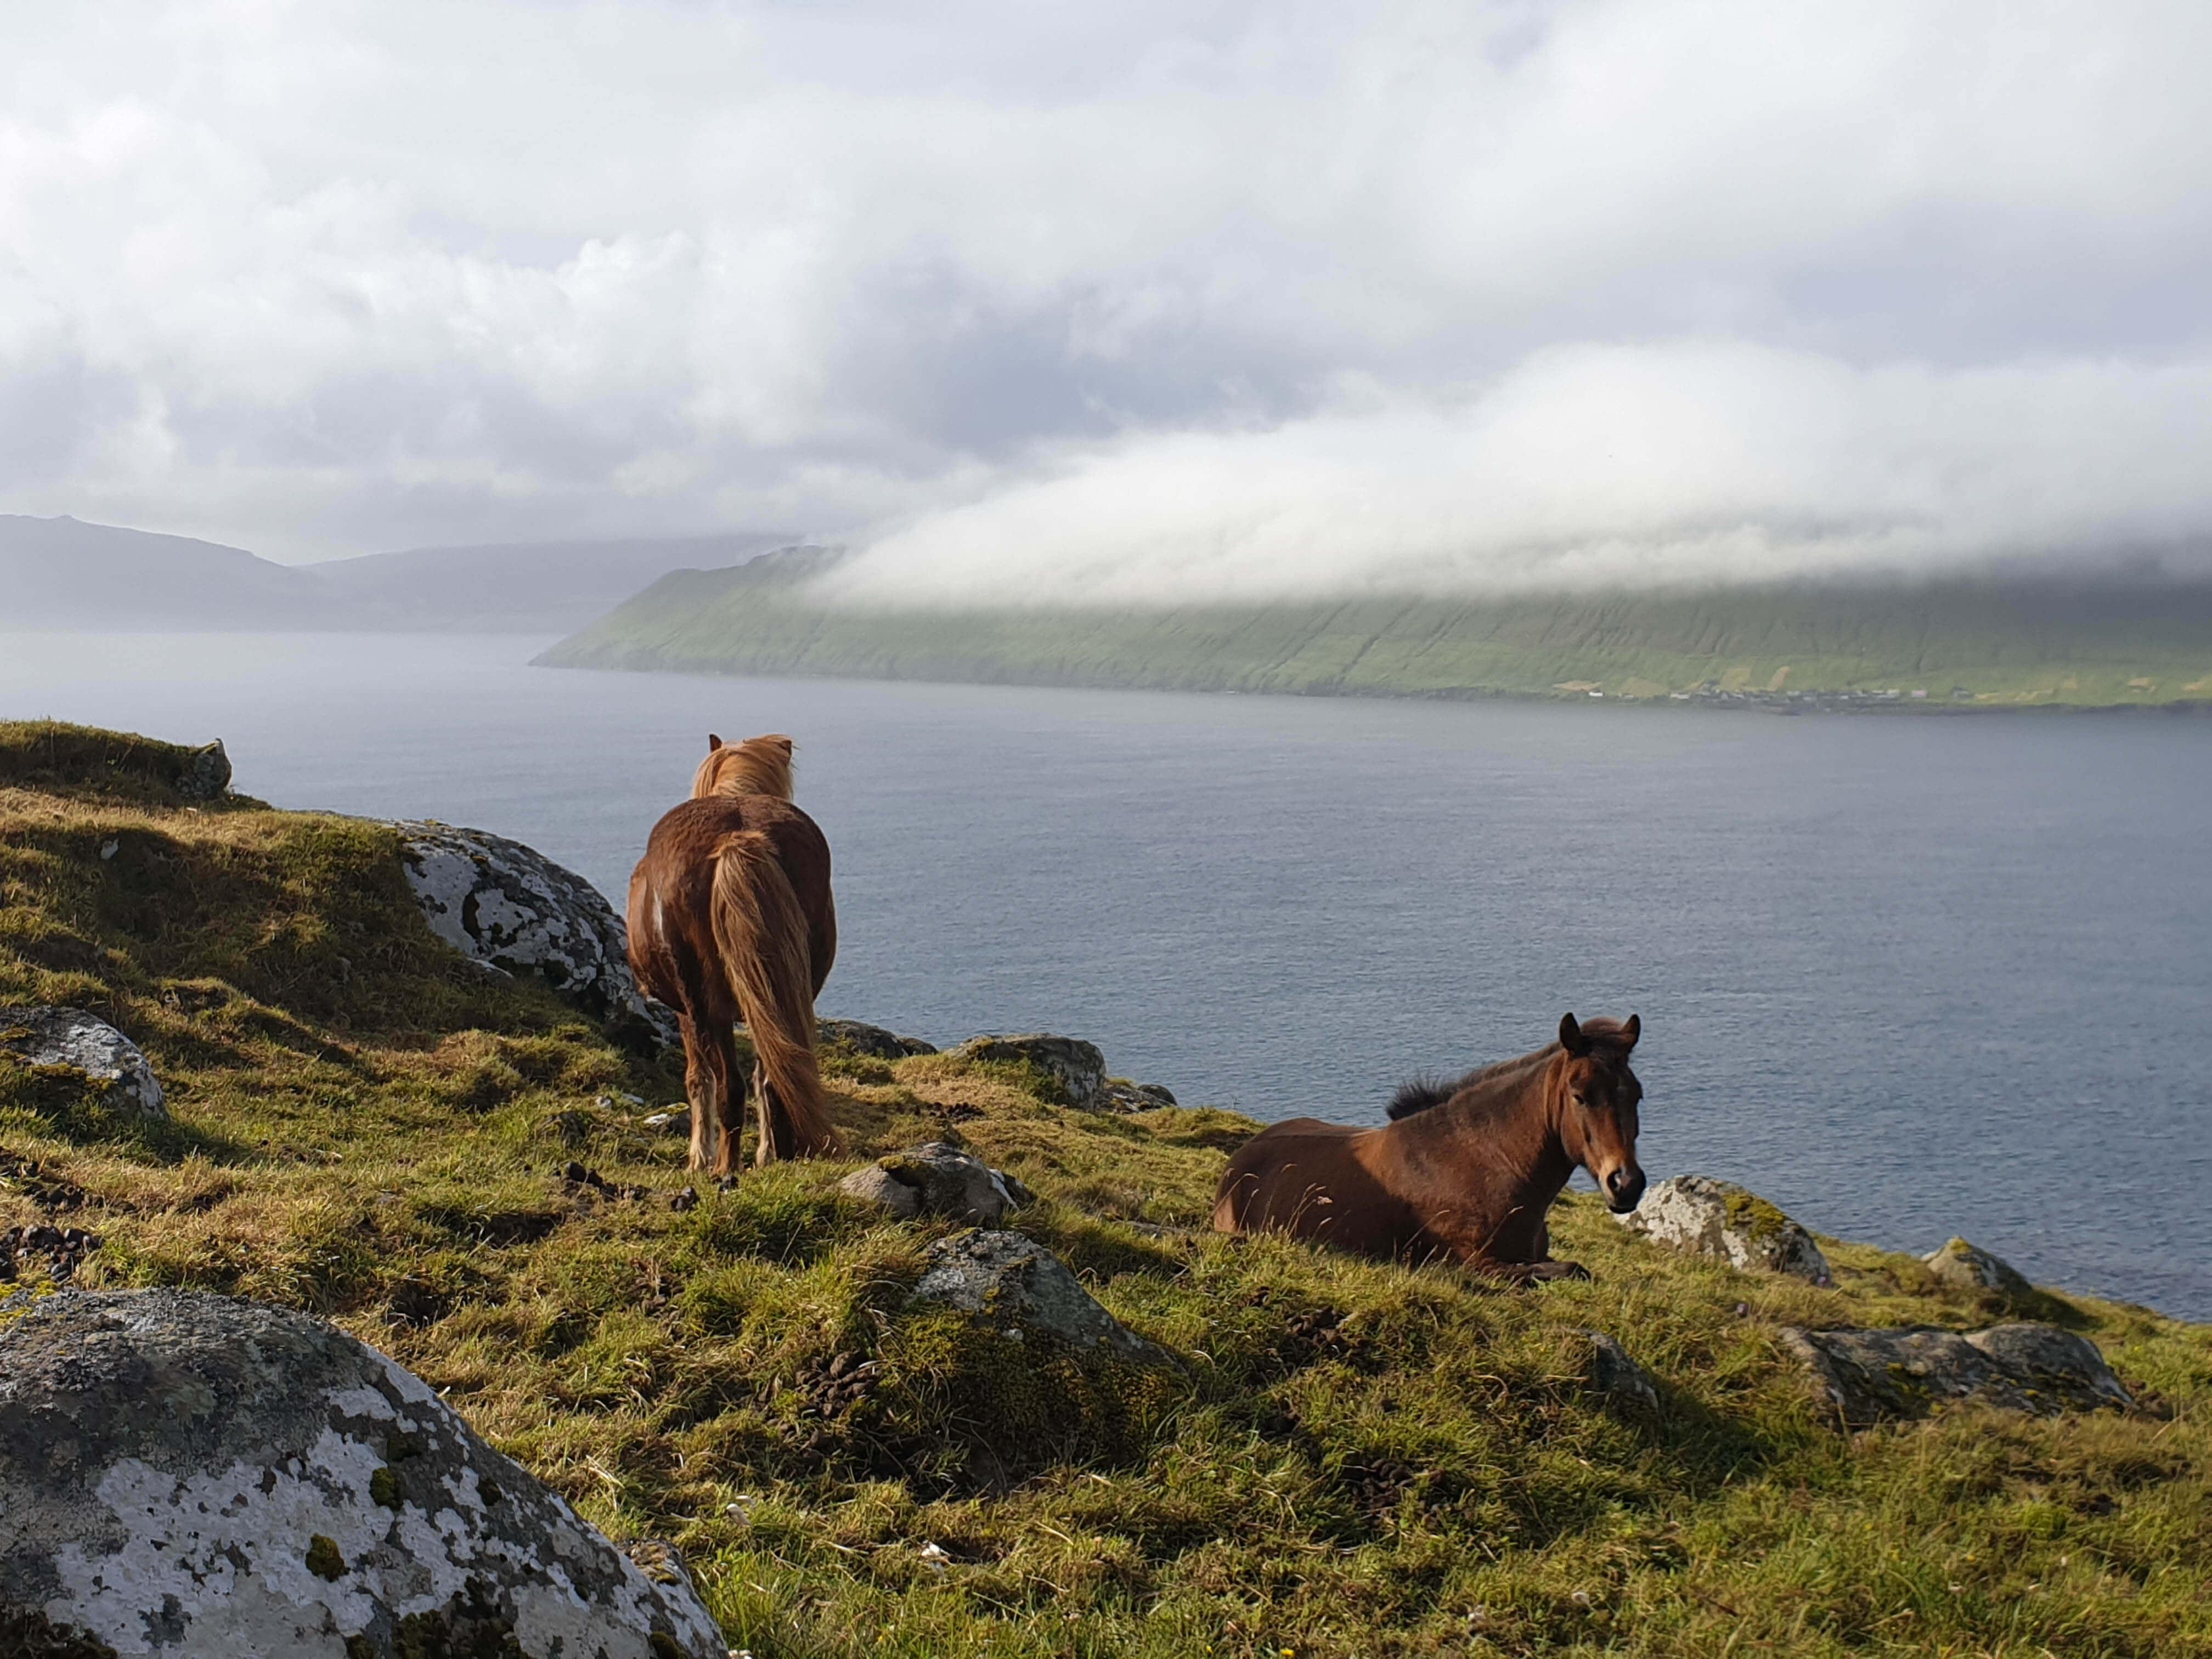 Faeröerse paarden